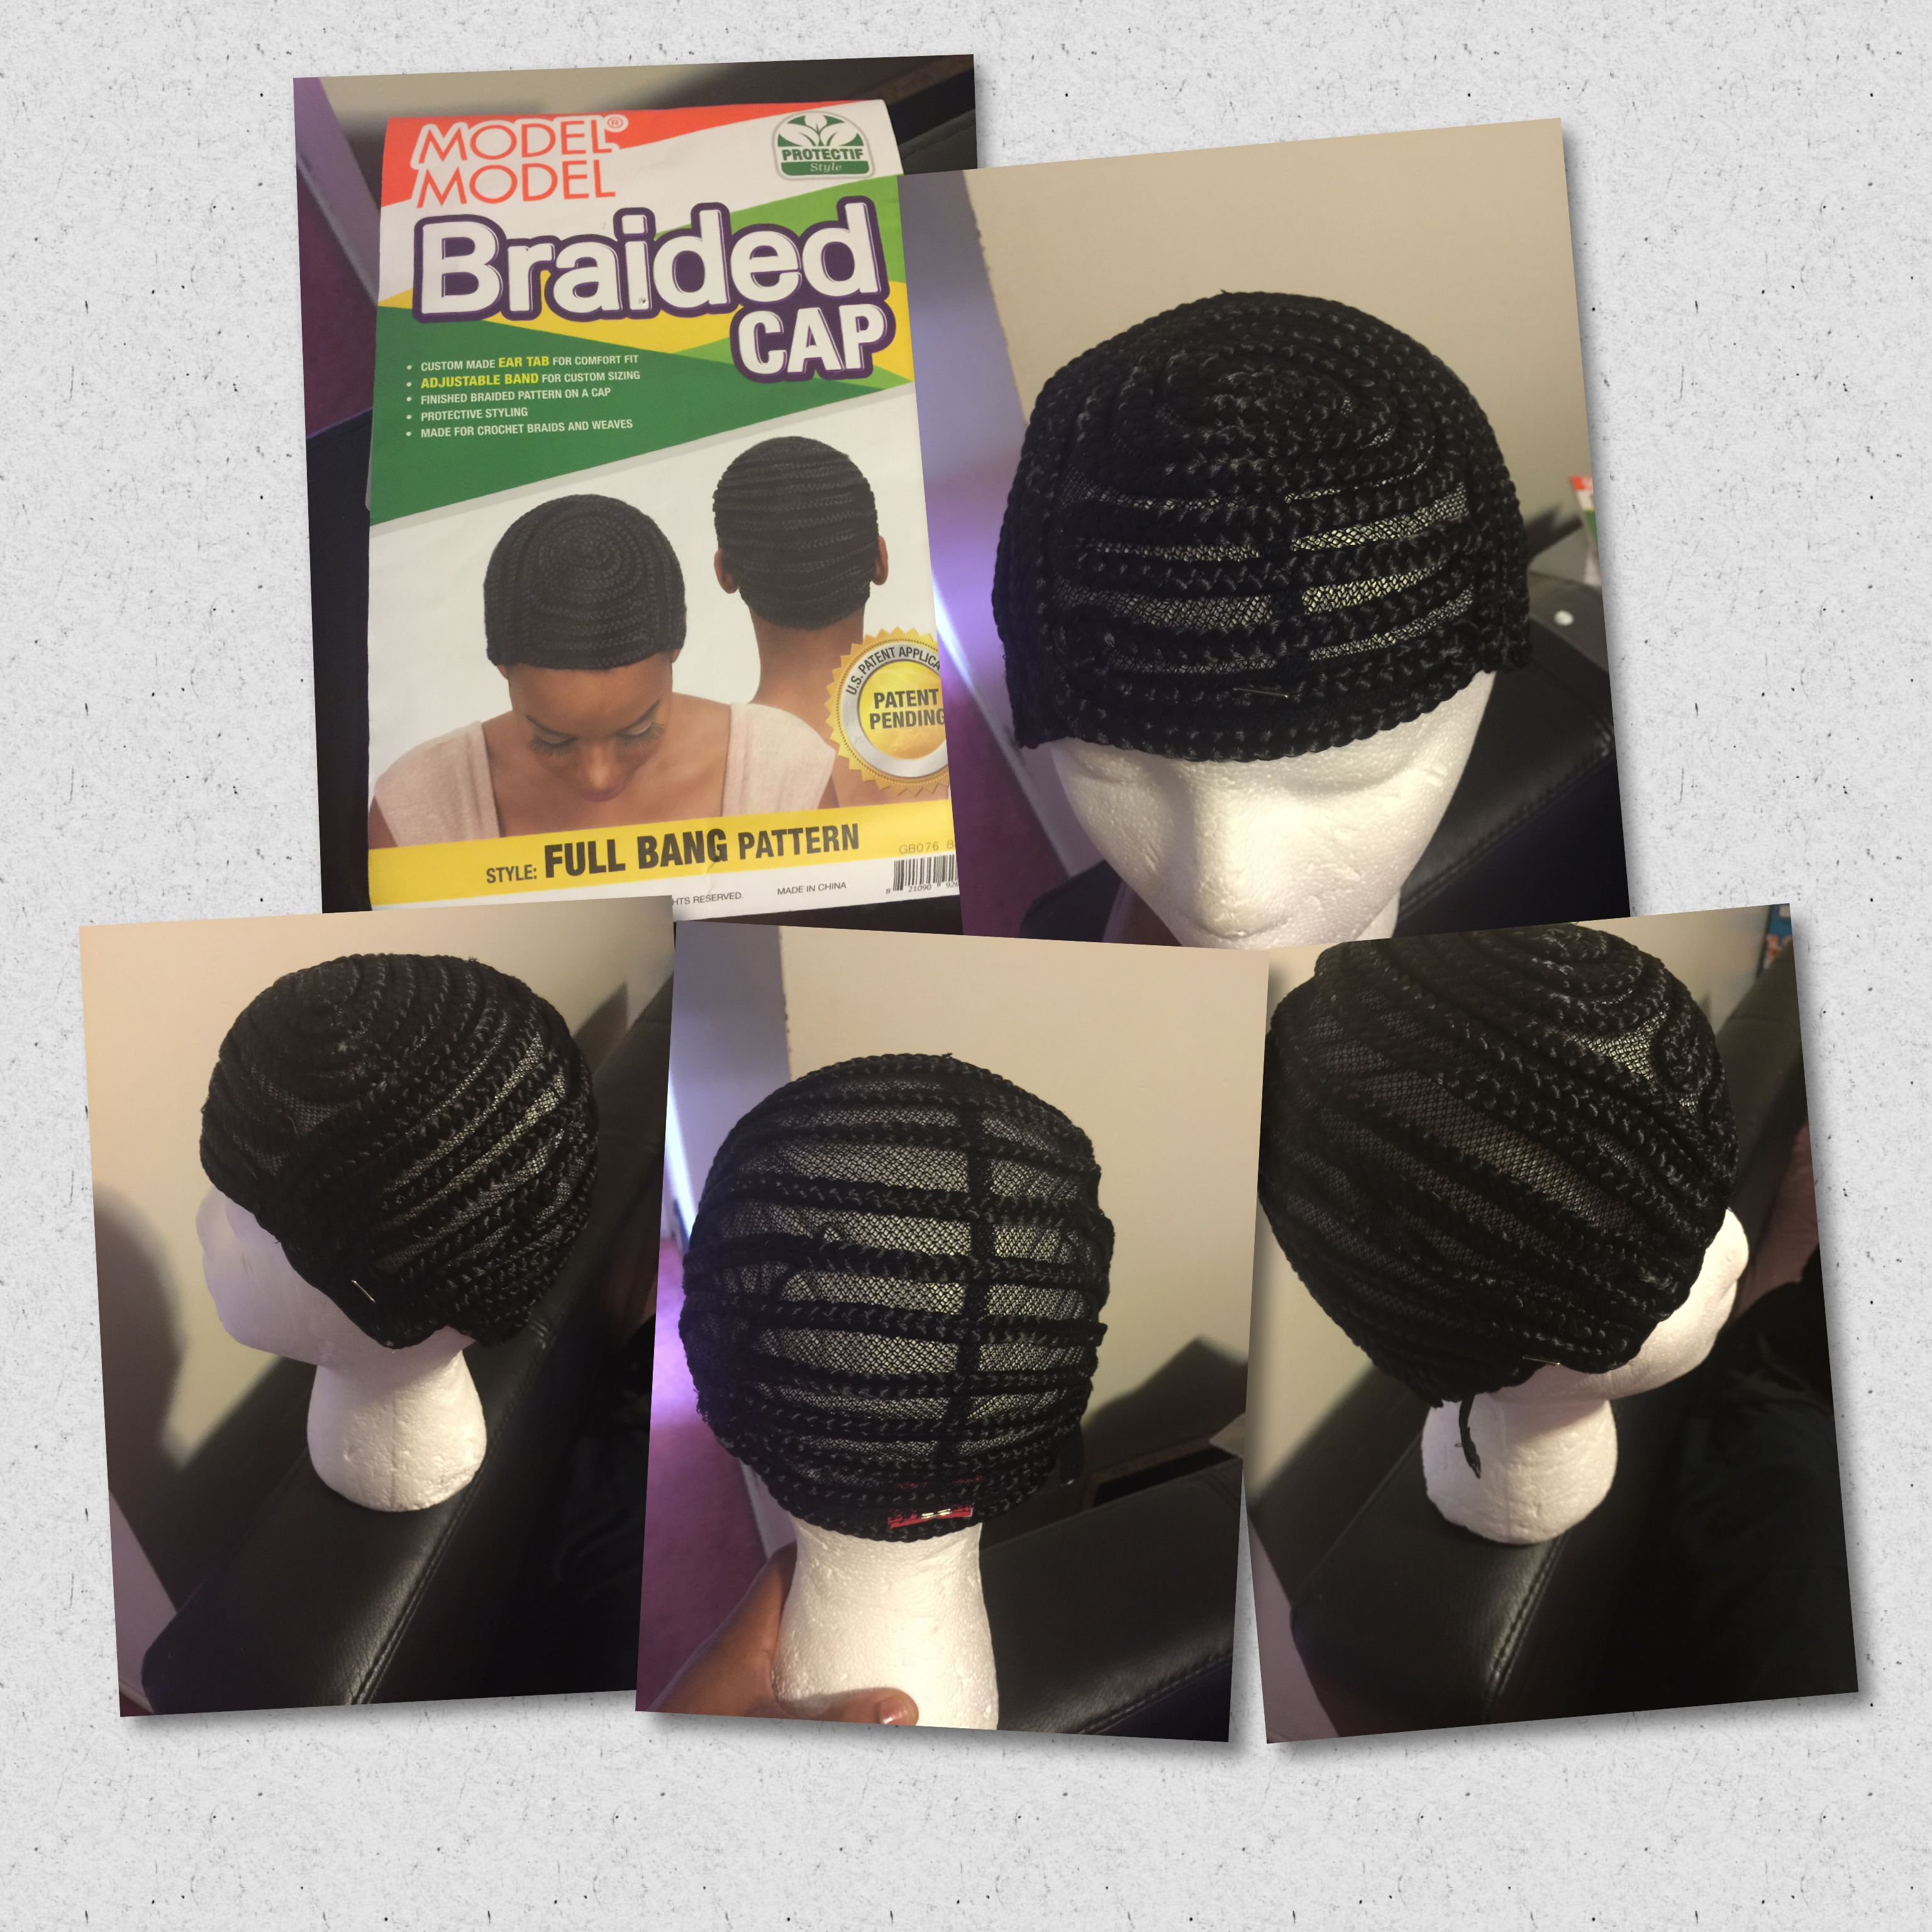 Braided Wig Cap For Crochet R Sew In Bestwigcapieveruse Hair Extensions Tutorial Crochet Wig Braided Wig